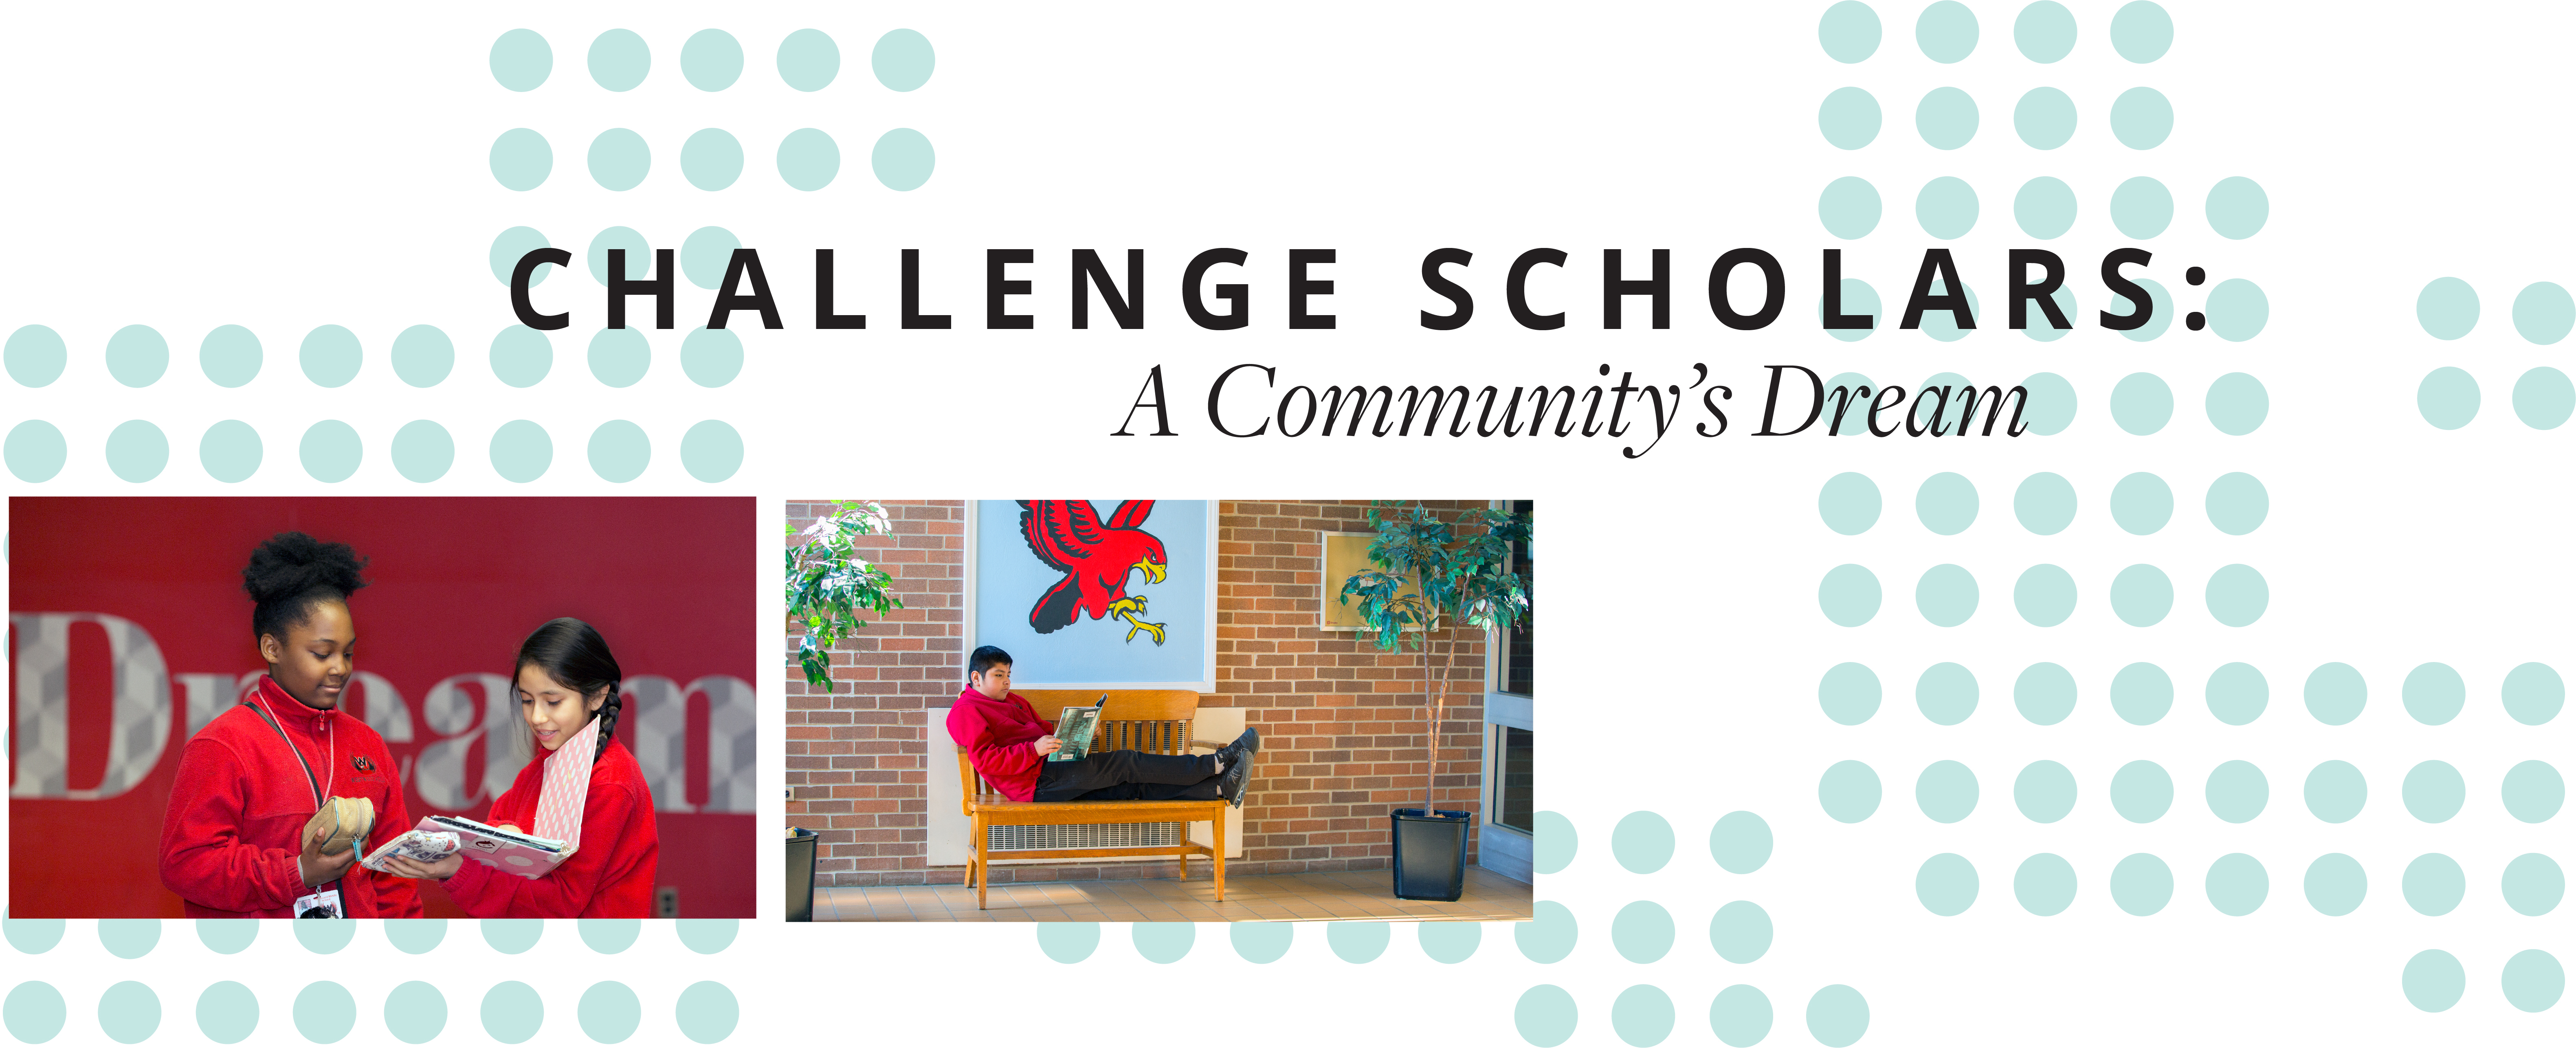 Challenge Scholars: A Community's Dream